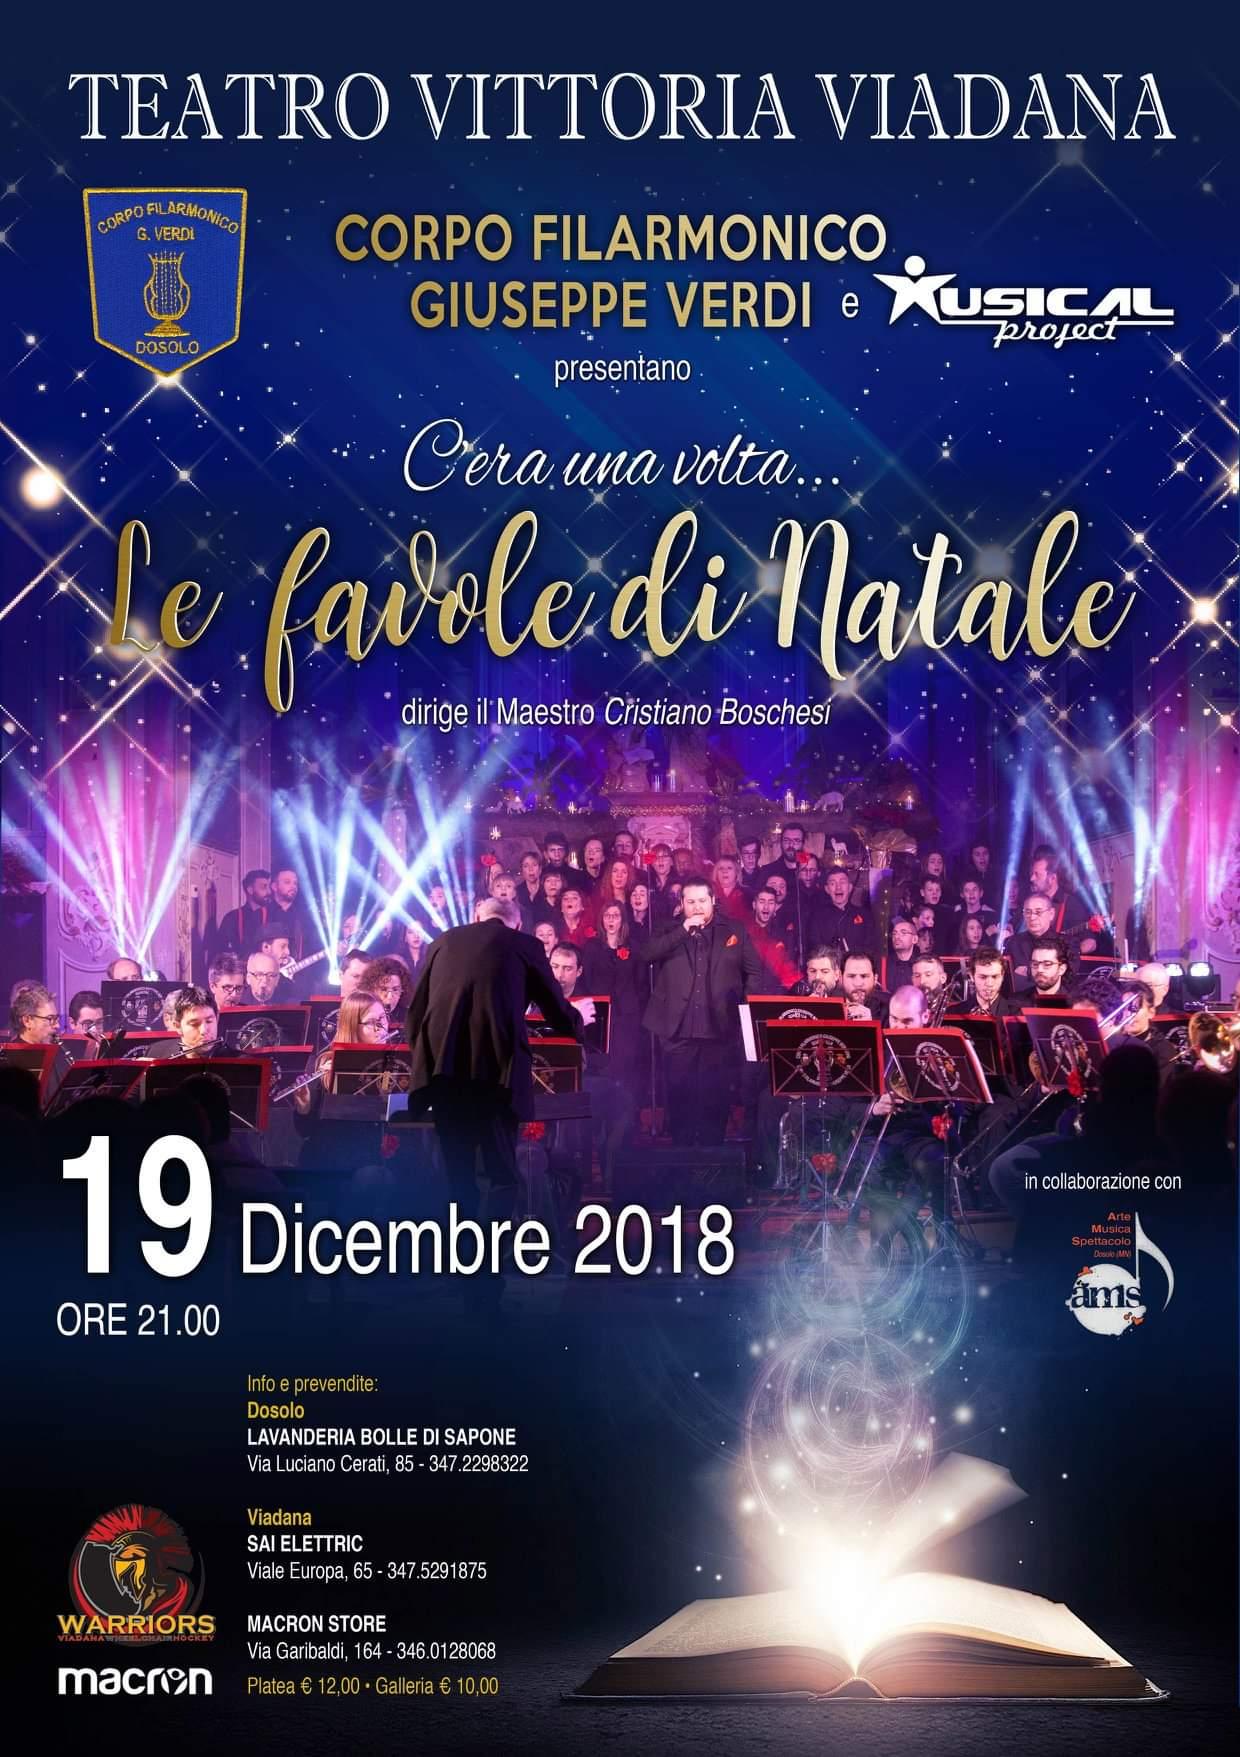 05/12/2018 - Il Corpo Filarmonico Giuseppe Verdi presenta